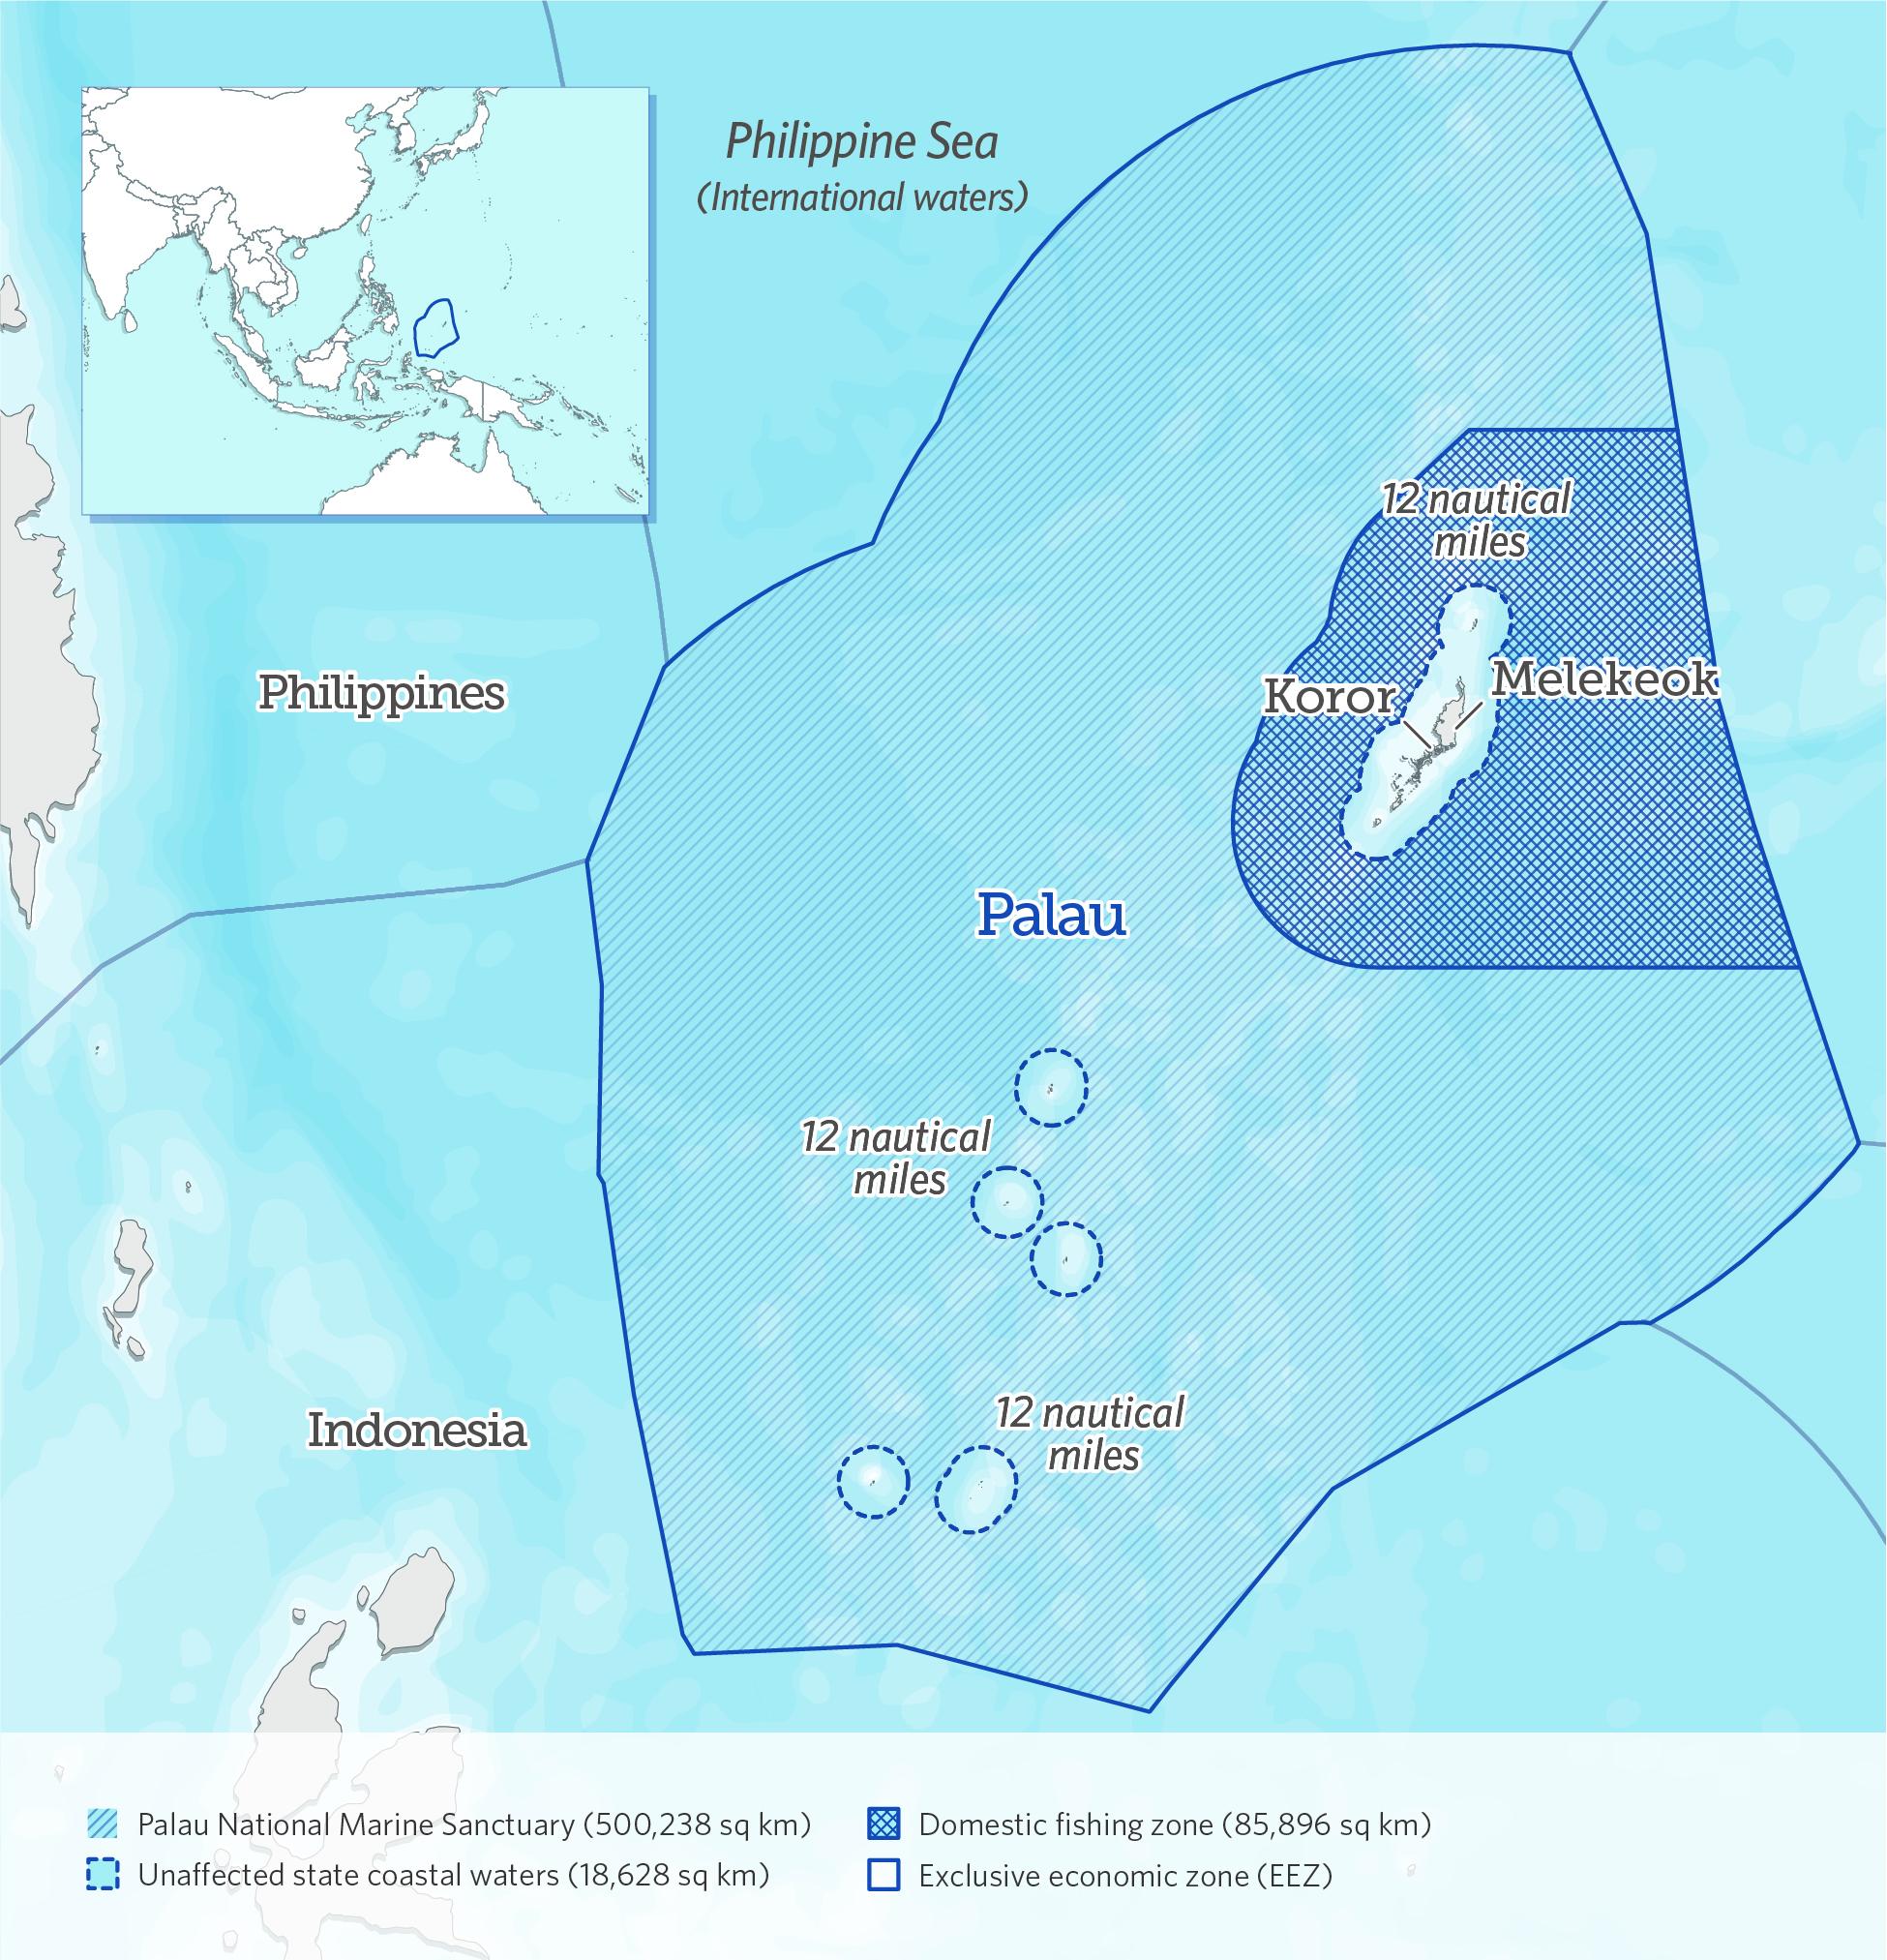 Palau National Marine Sanctuary | The Pew Charitable Trusts